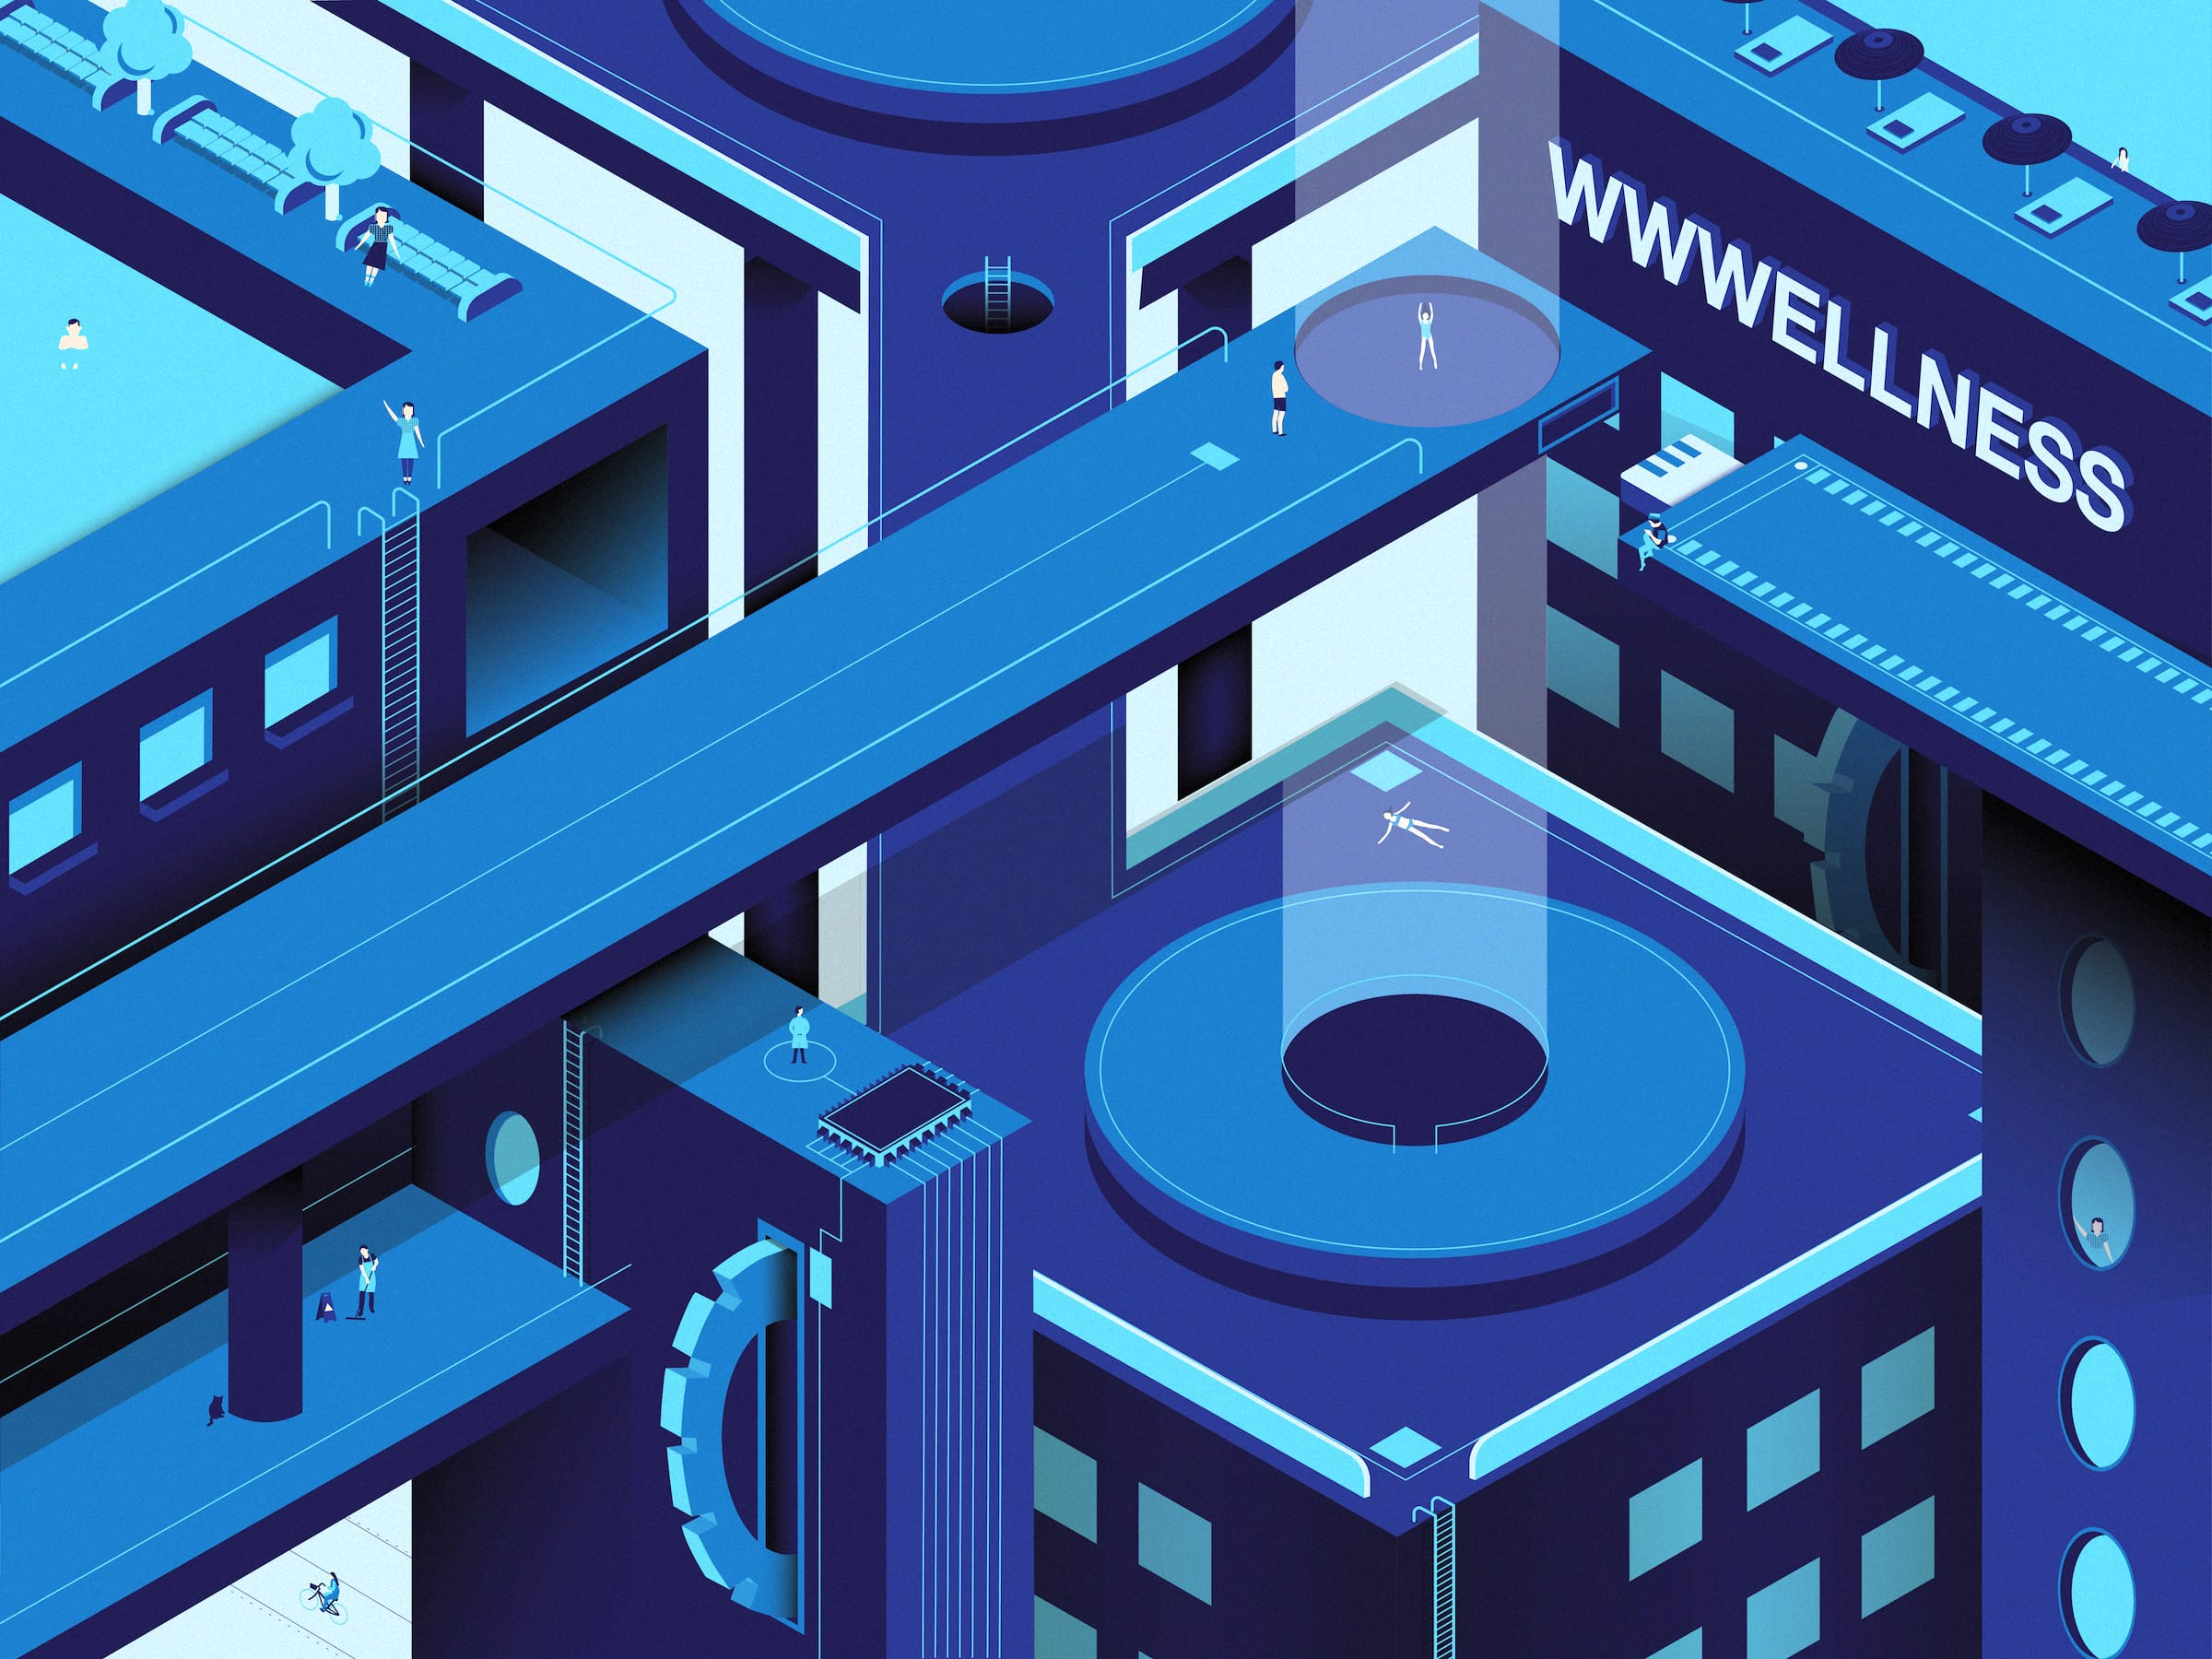 Wwwellness centre